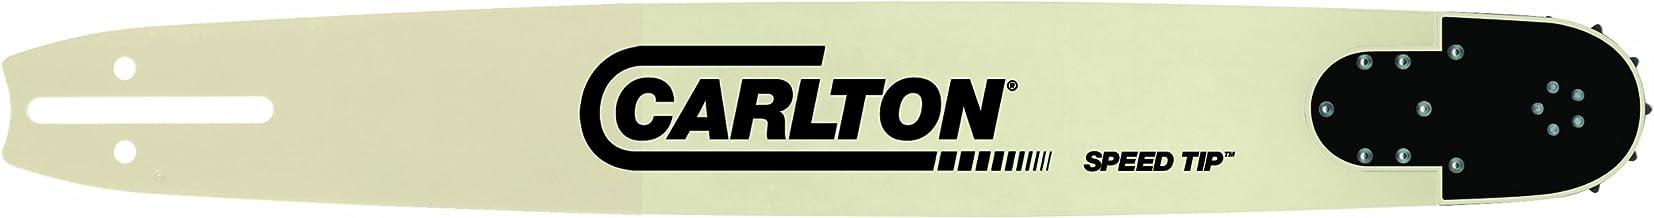 Carlton 18-81-A168-ST Speed Tip Chainsaw Cutting Bar, 18-Inch